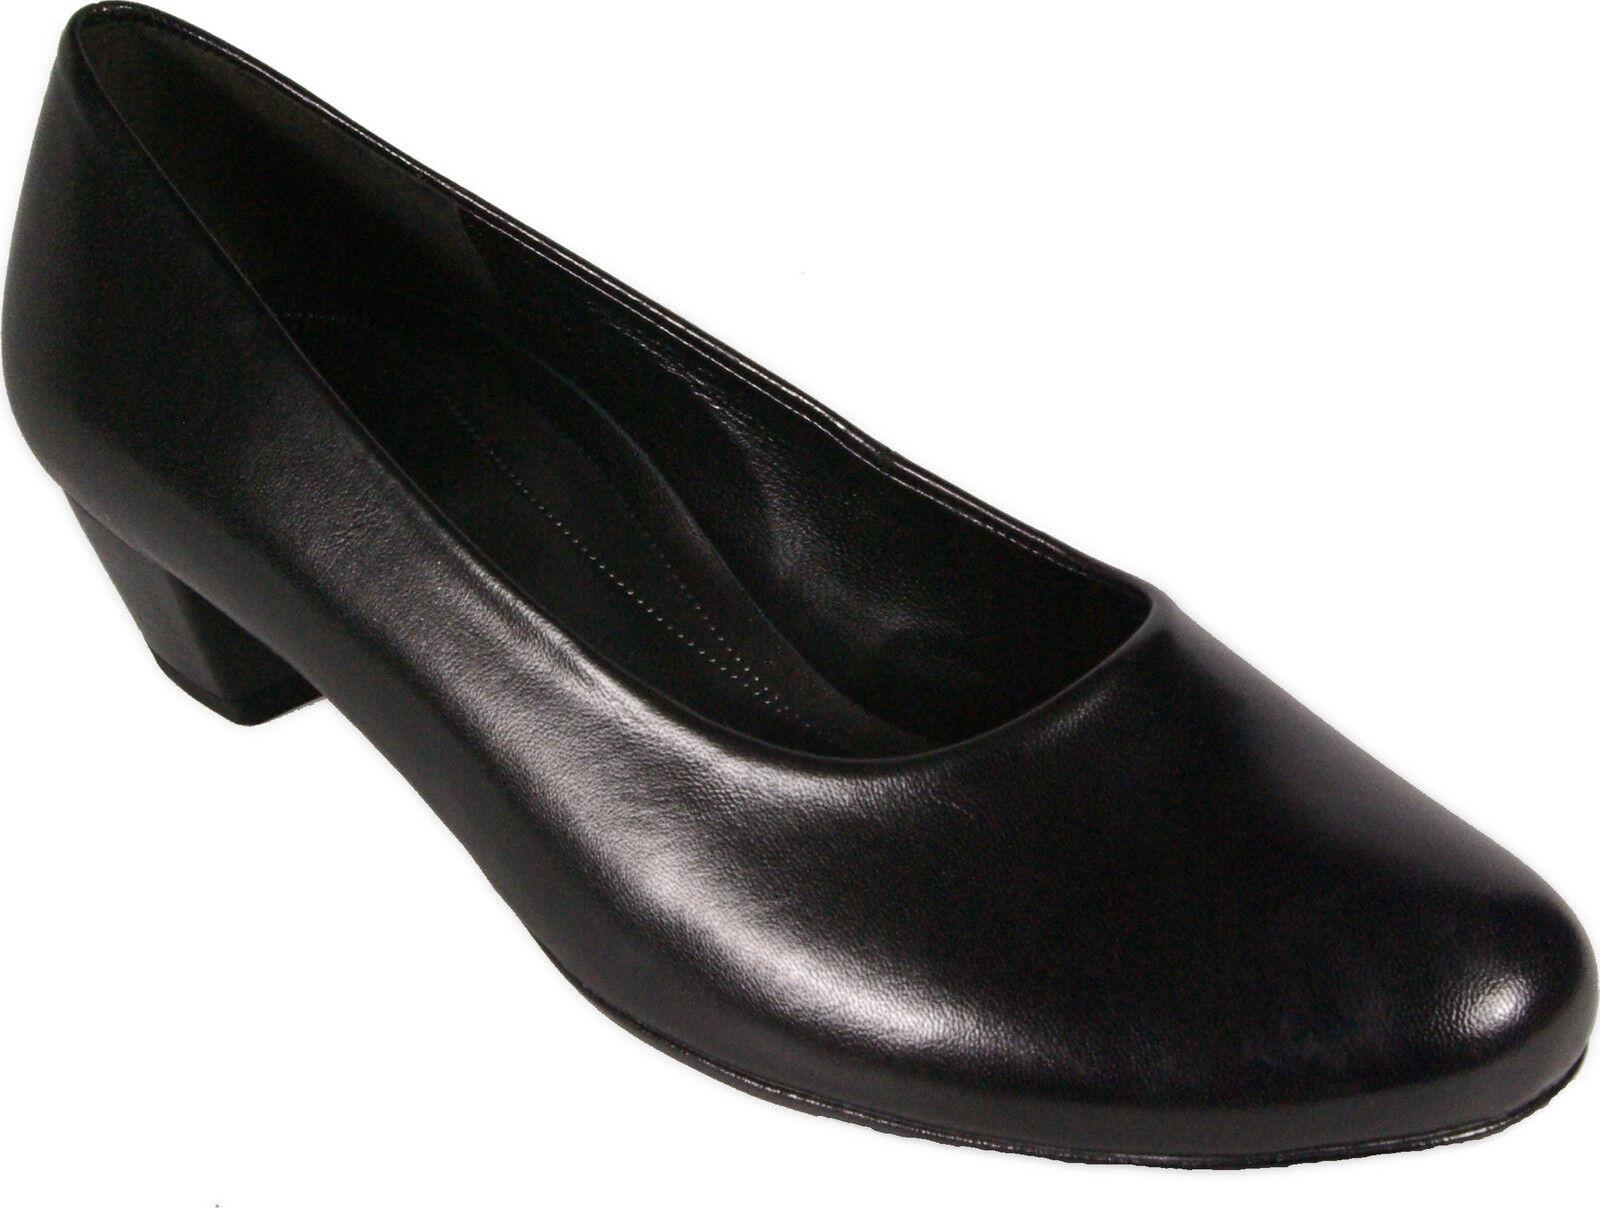 GABOR Schuhe  Pumps schwarz echt Leder  Schuhe H-Weite Absatz 35 mm NEU ea62f3